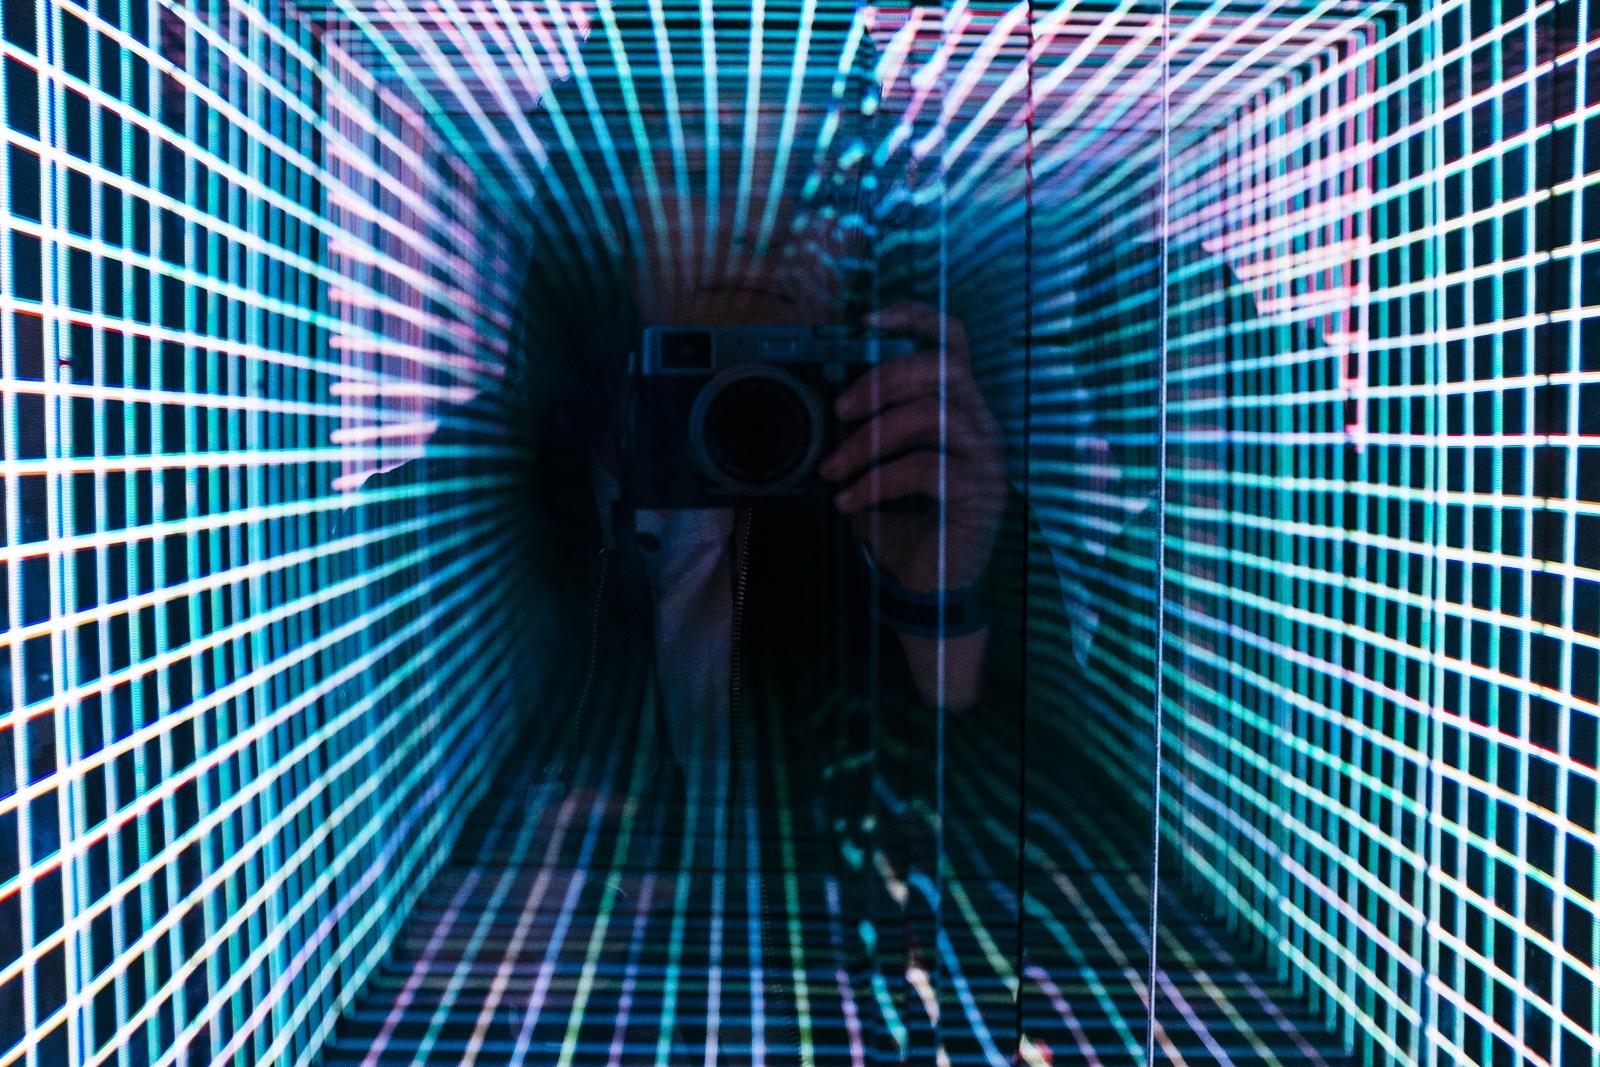 Art and Documentary Photography - Loading DSCF7324.jpg